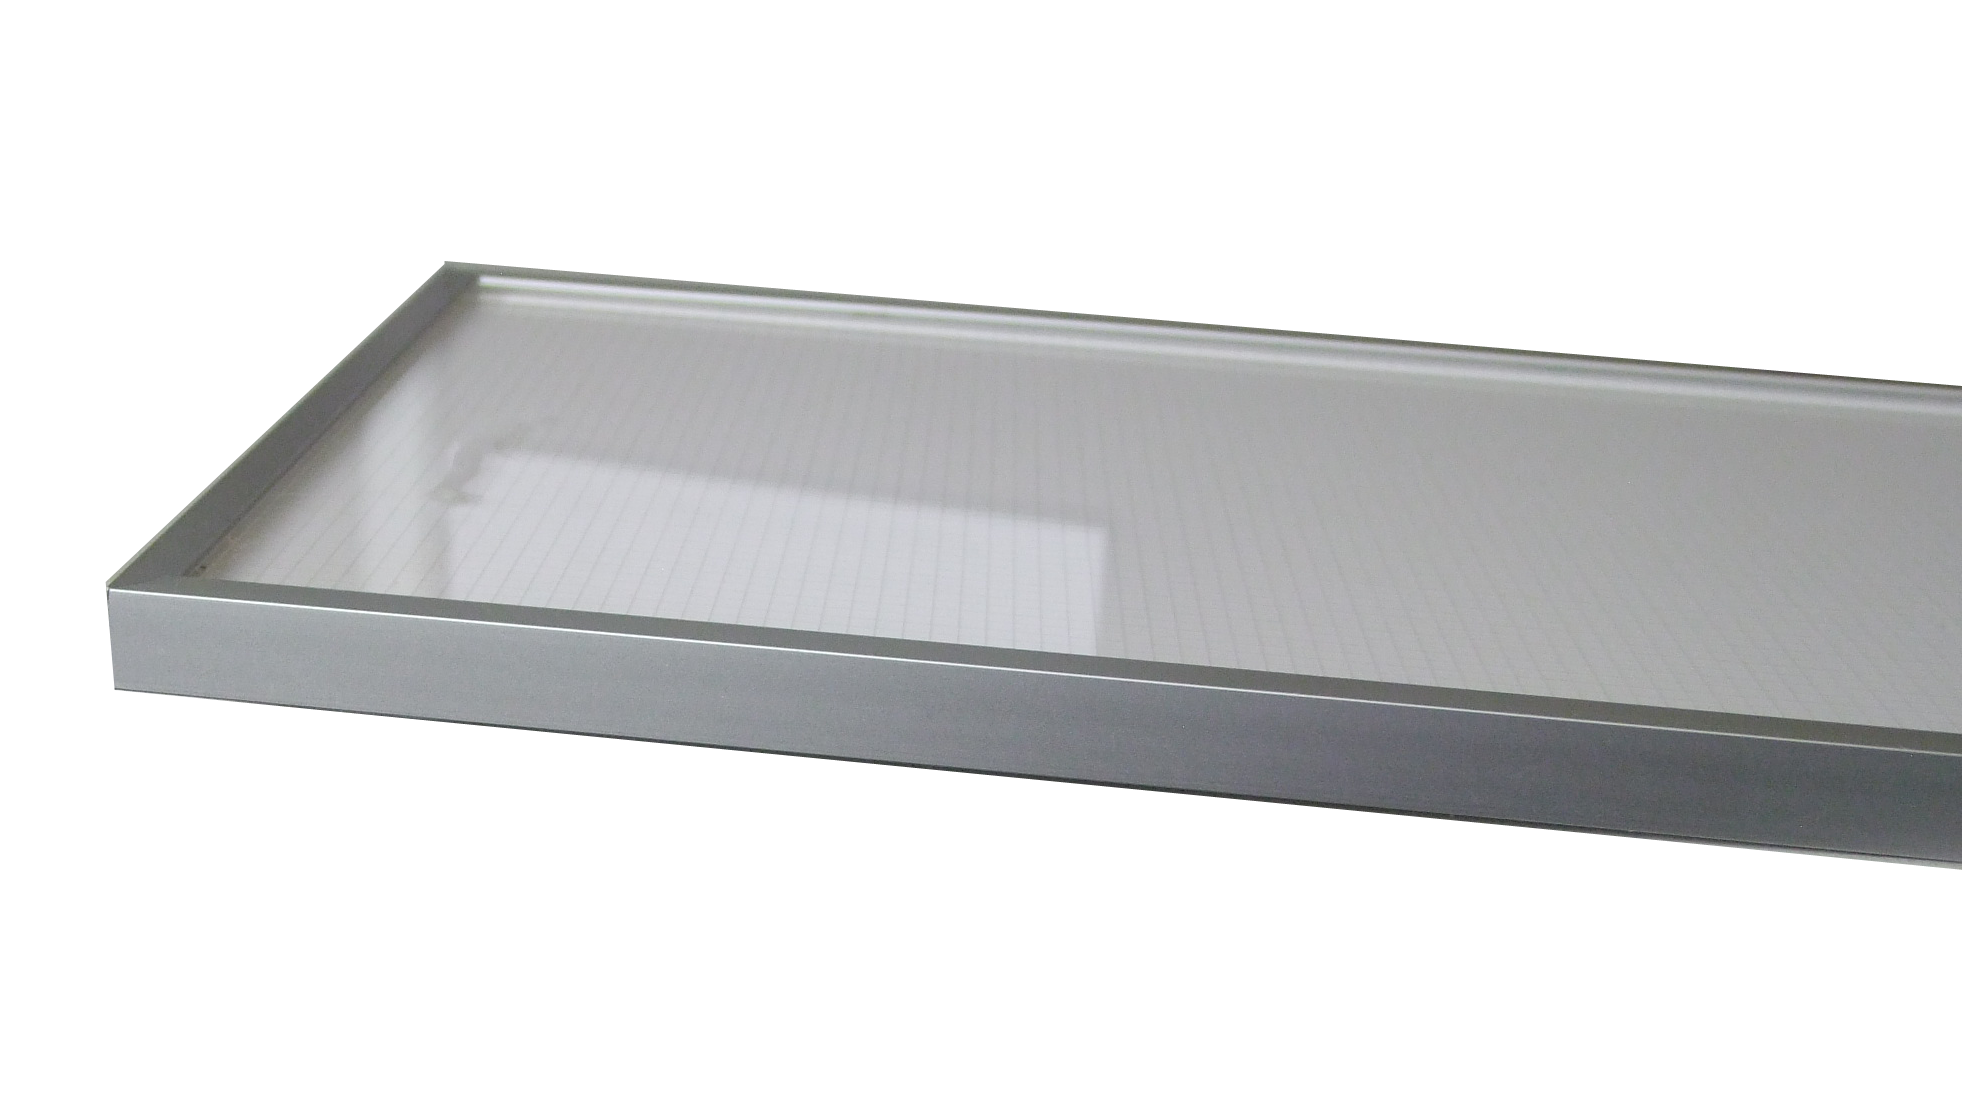 light-panel-genII-corner-frame-view